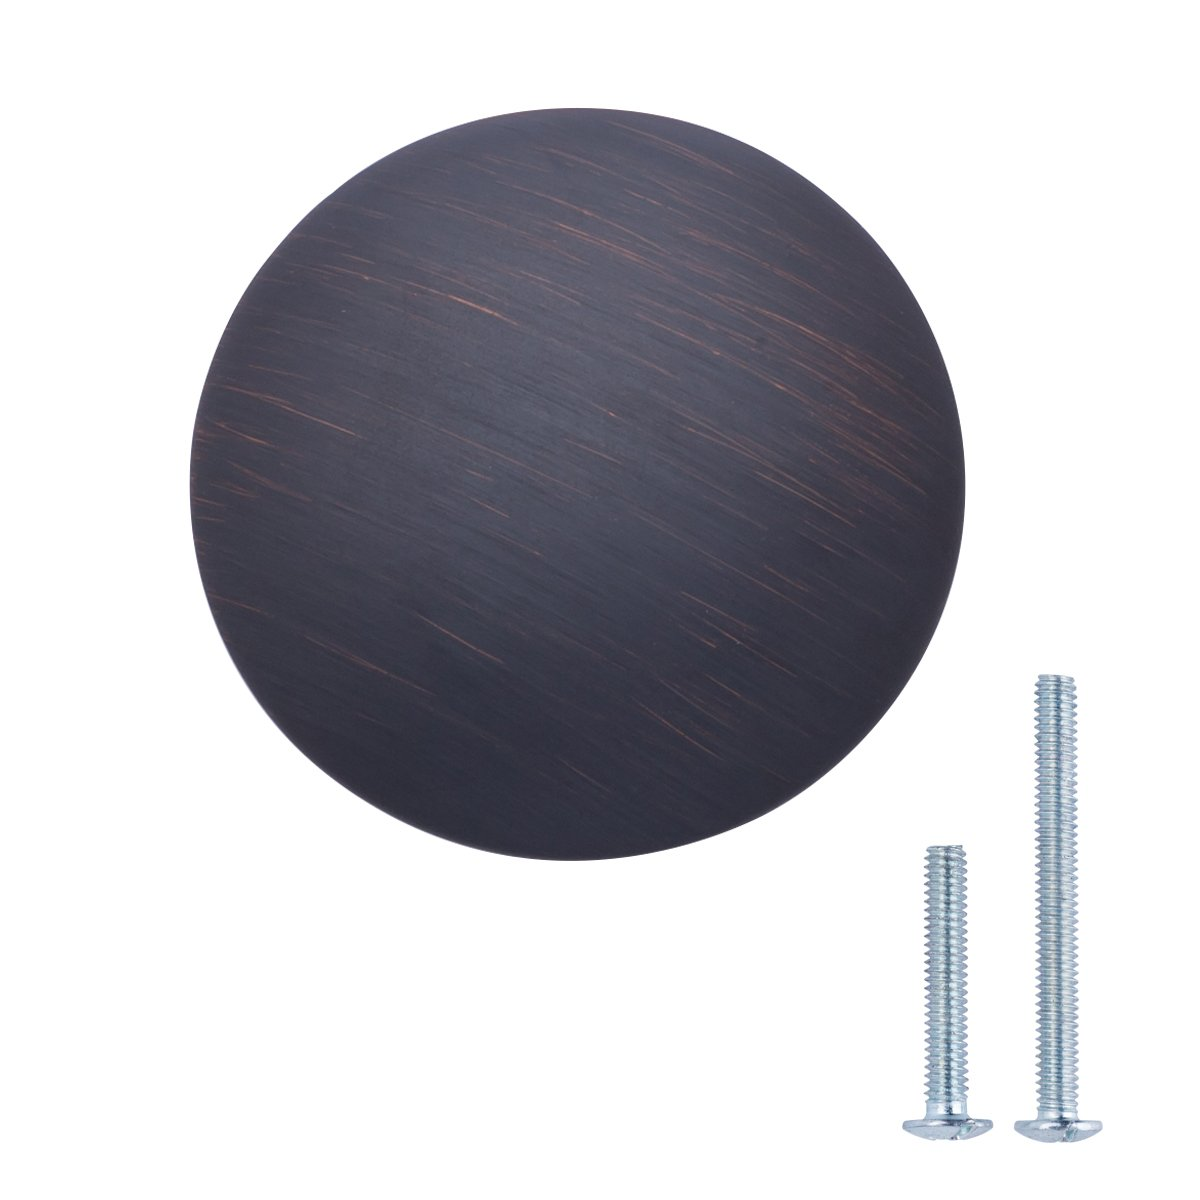 2,99 cm de di/ámetro Plata envejecidado Basics Pomo de armario redondo Paquete de 25